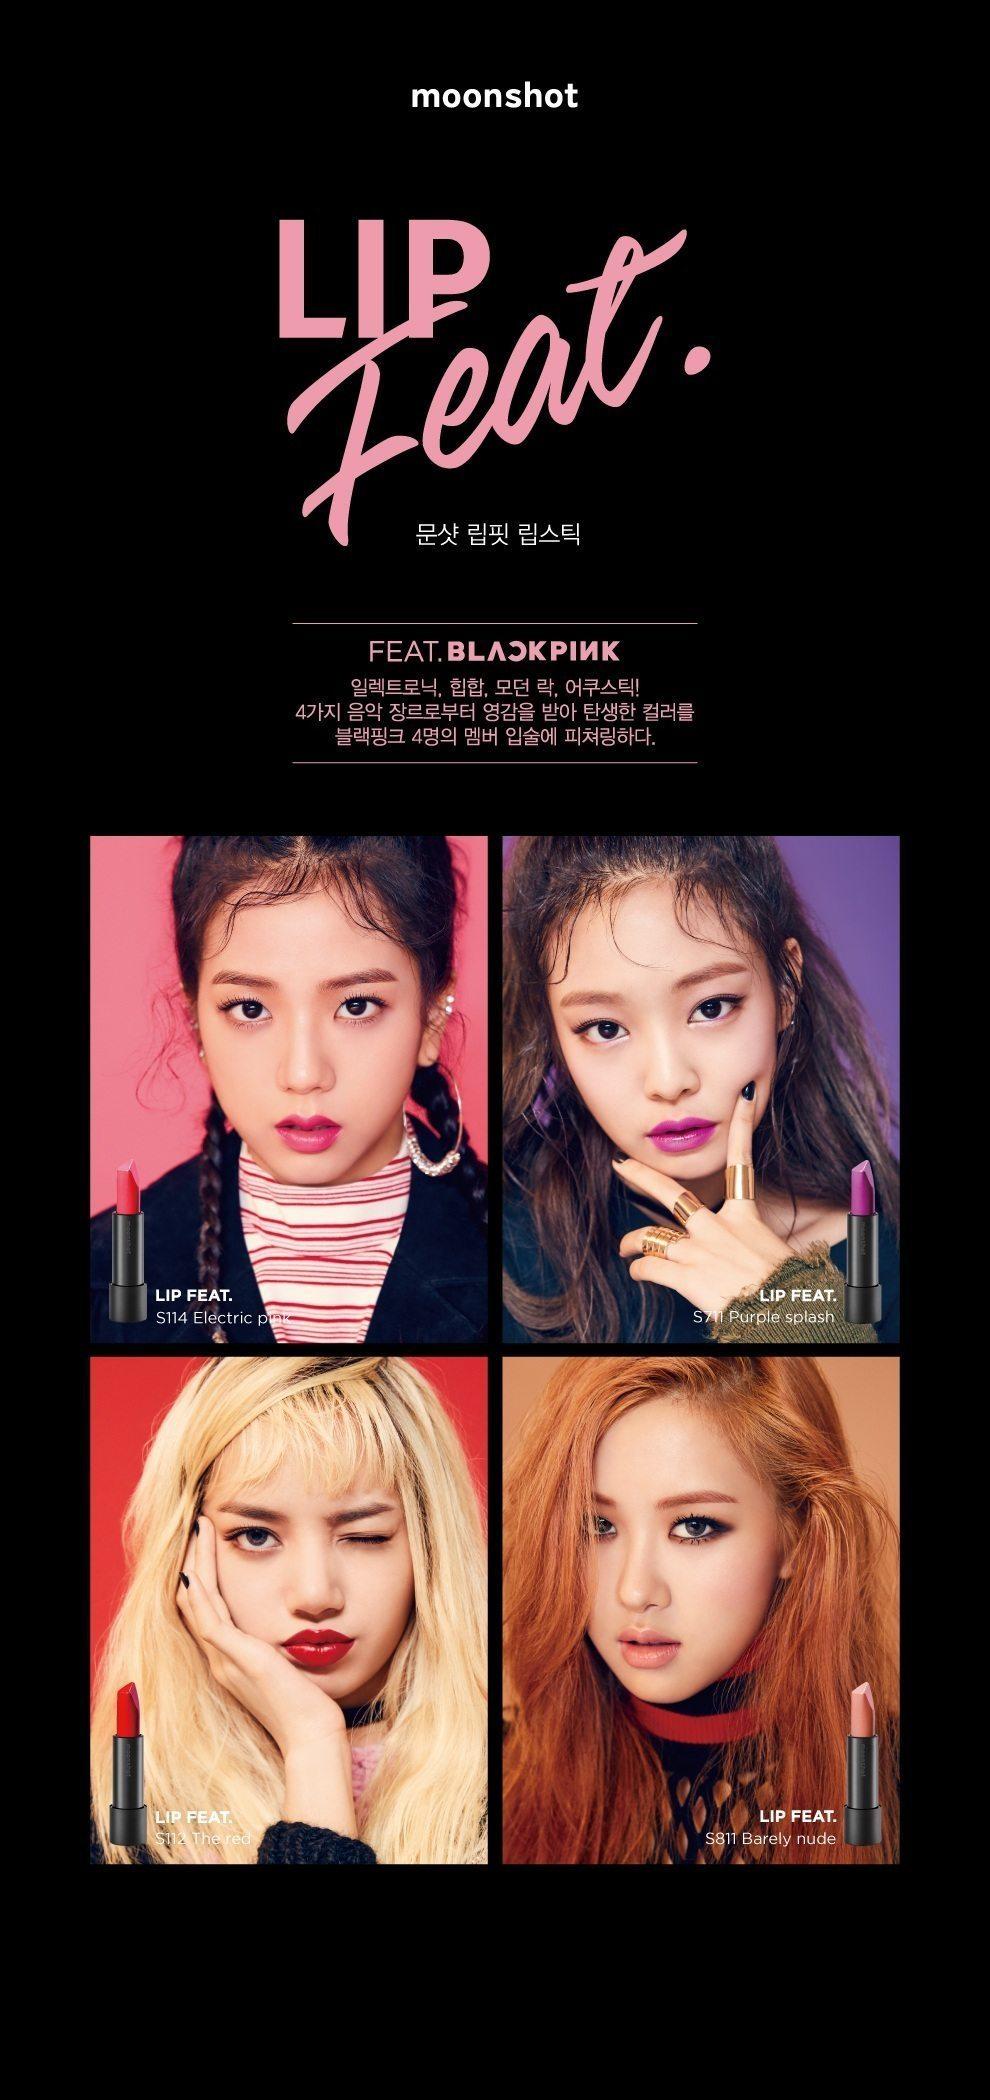 Moonshot Lip Feat Lipstick korean cosmetic makeup product online shop malaysia uk taiwan1